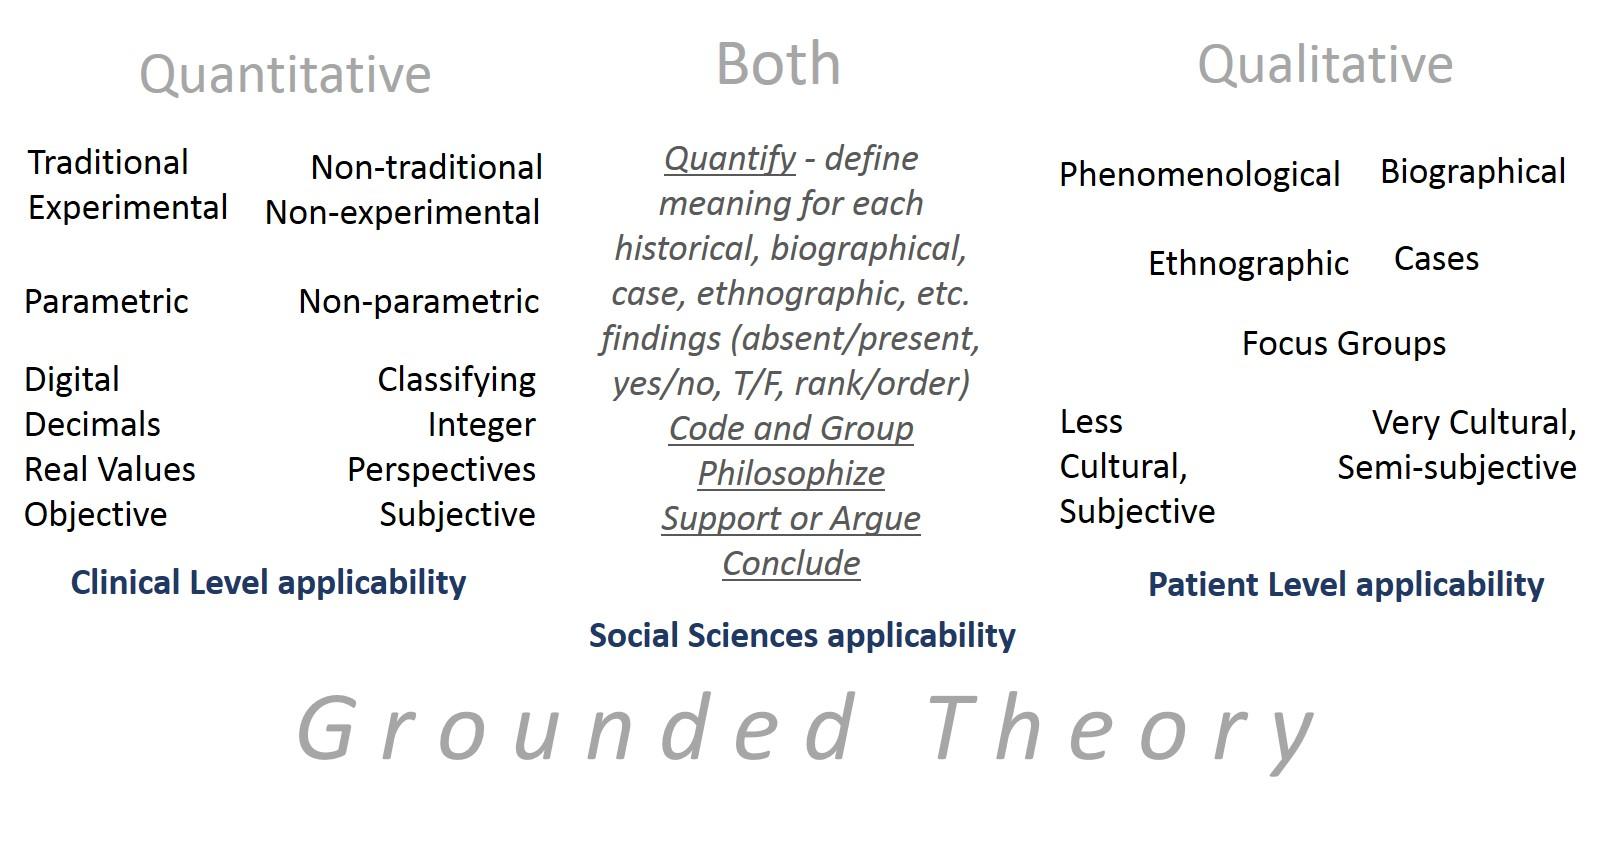 quantitative article review research paper essay for you quantitative article review research paper image 10